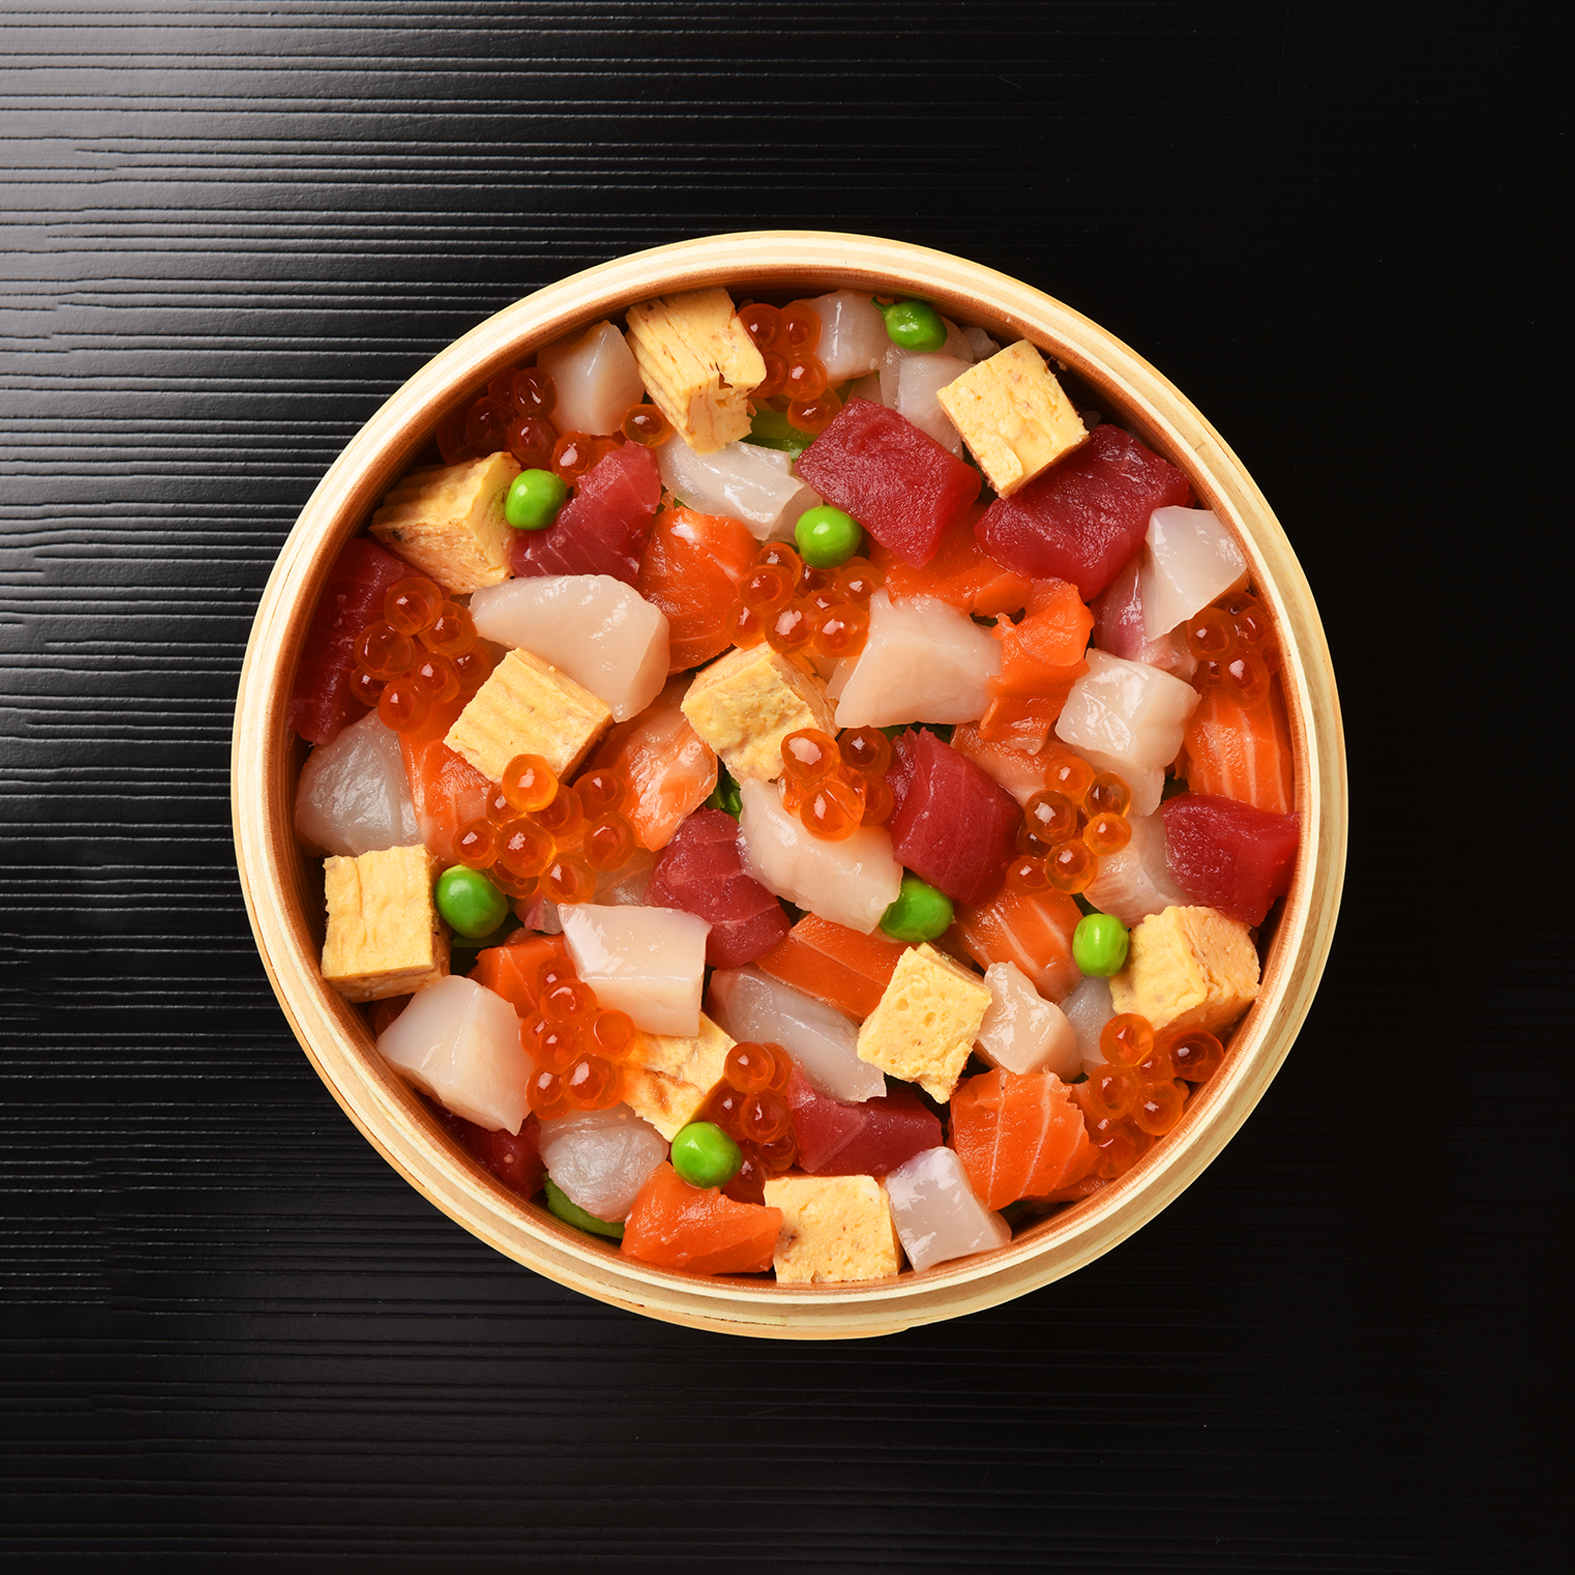 Bara-zushi Bento